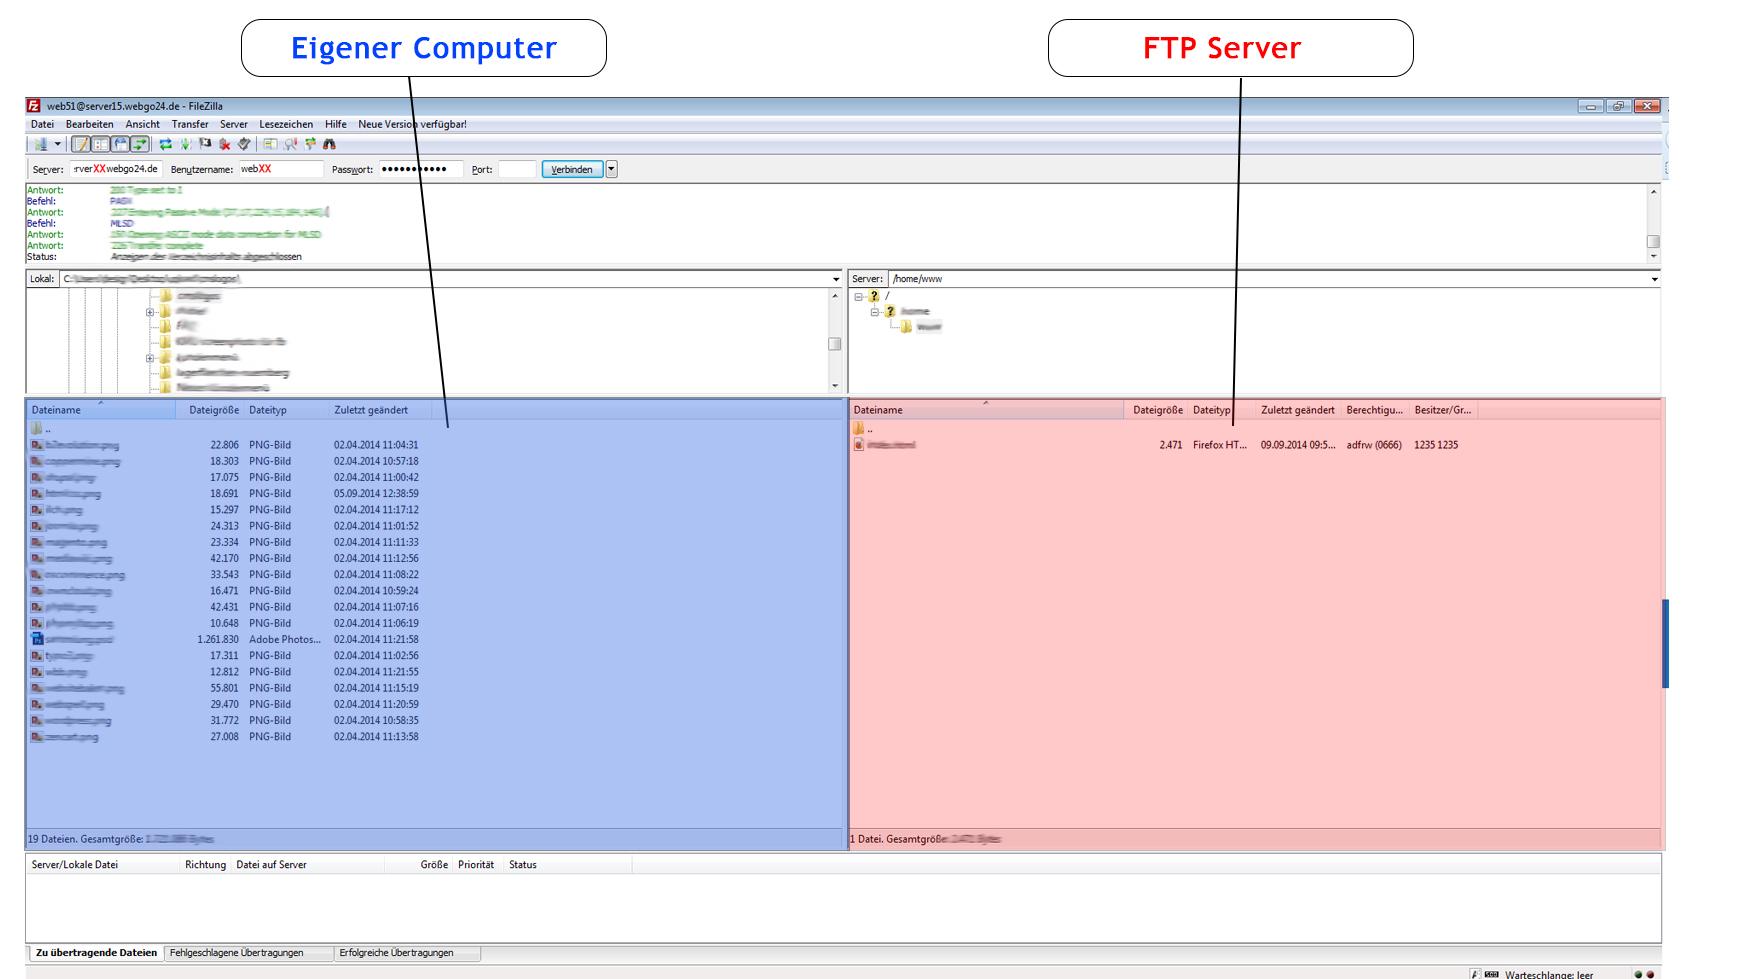 Filezilla_Compuert_FTP_Server